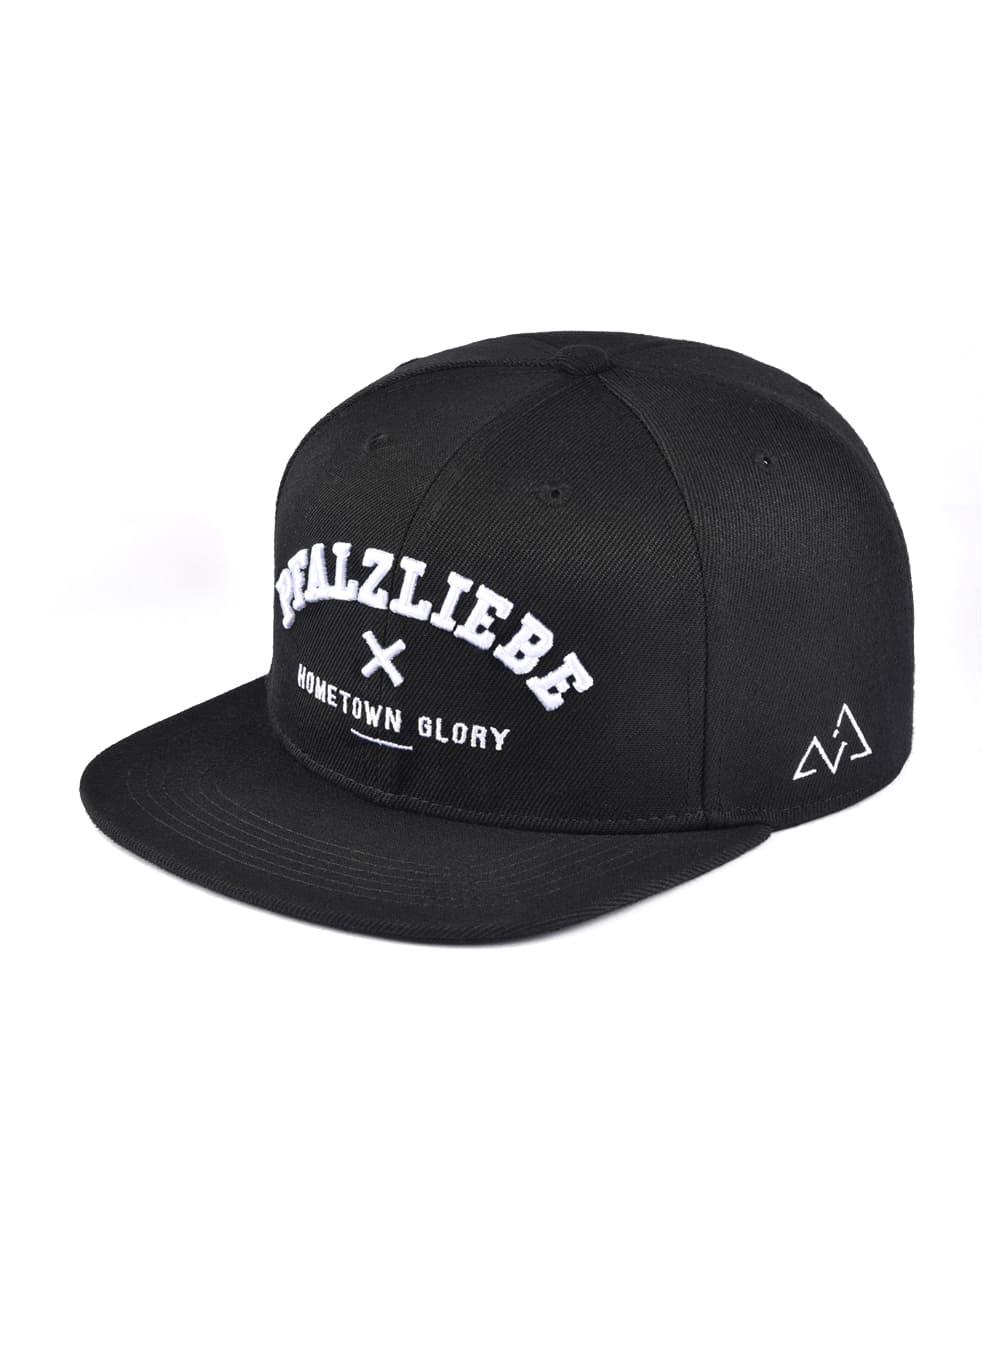 00da1adc1082c3 PFALZLIEBE 2.0 CAP BLACK   Palatina Outfitters